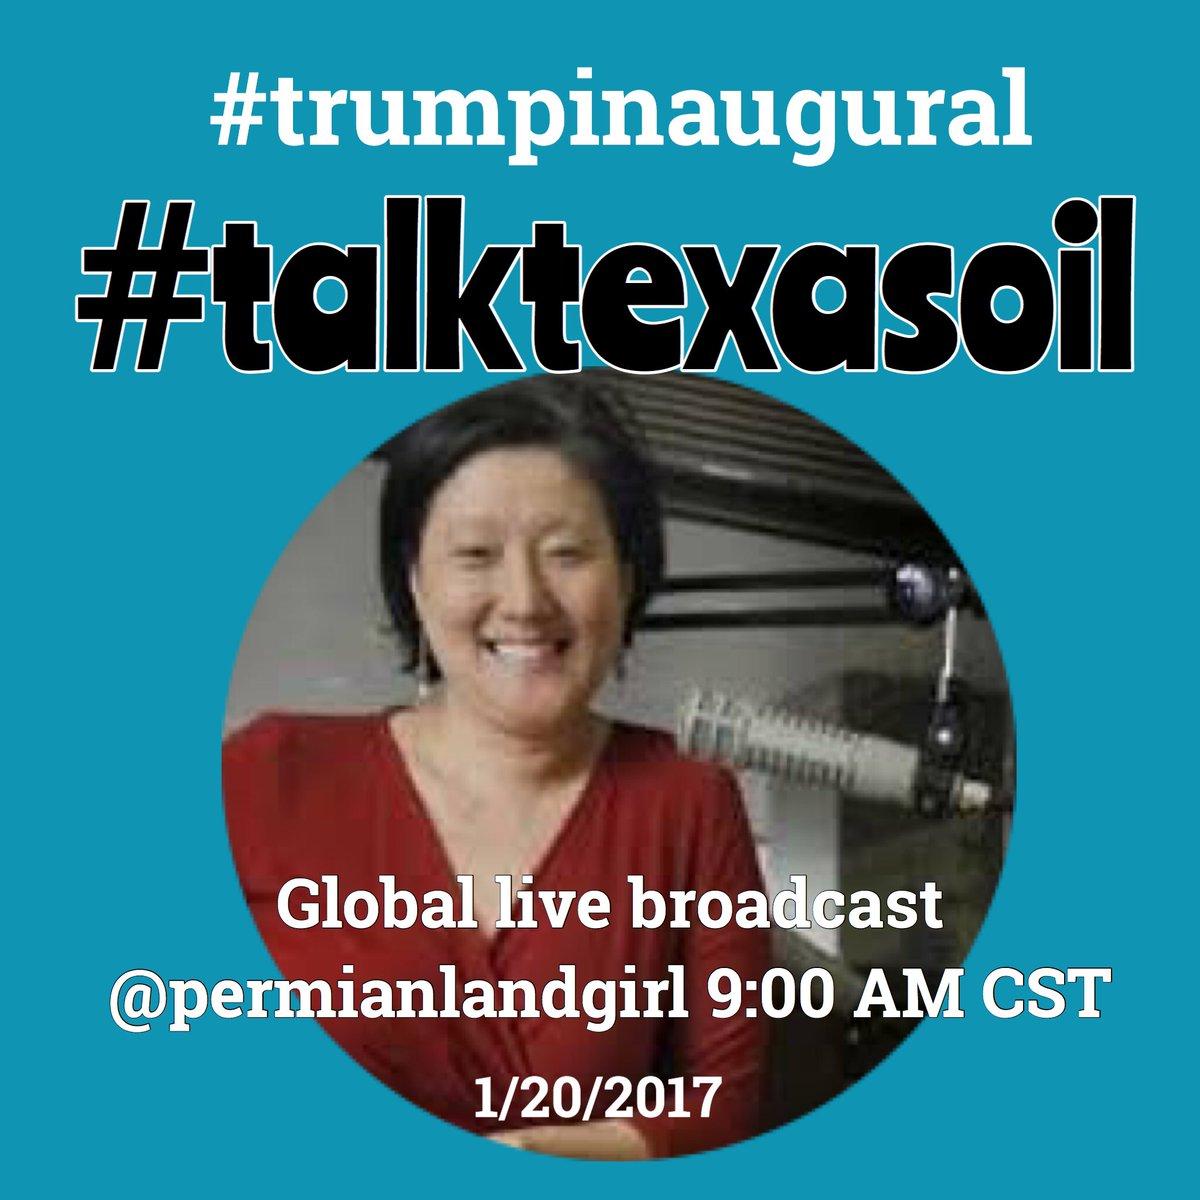 #TillersonConfirmation #talktexasoil will discuss #tillerson periscopetv on @TrumpInaugural @OCTG_Network @katyabee4 @Lanawrites<br>http://pic.twitter.com/nYqG8az5GQ